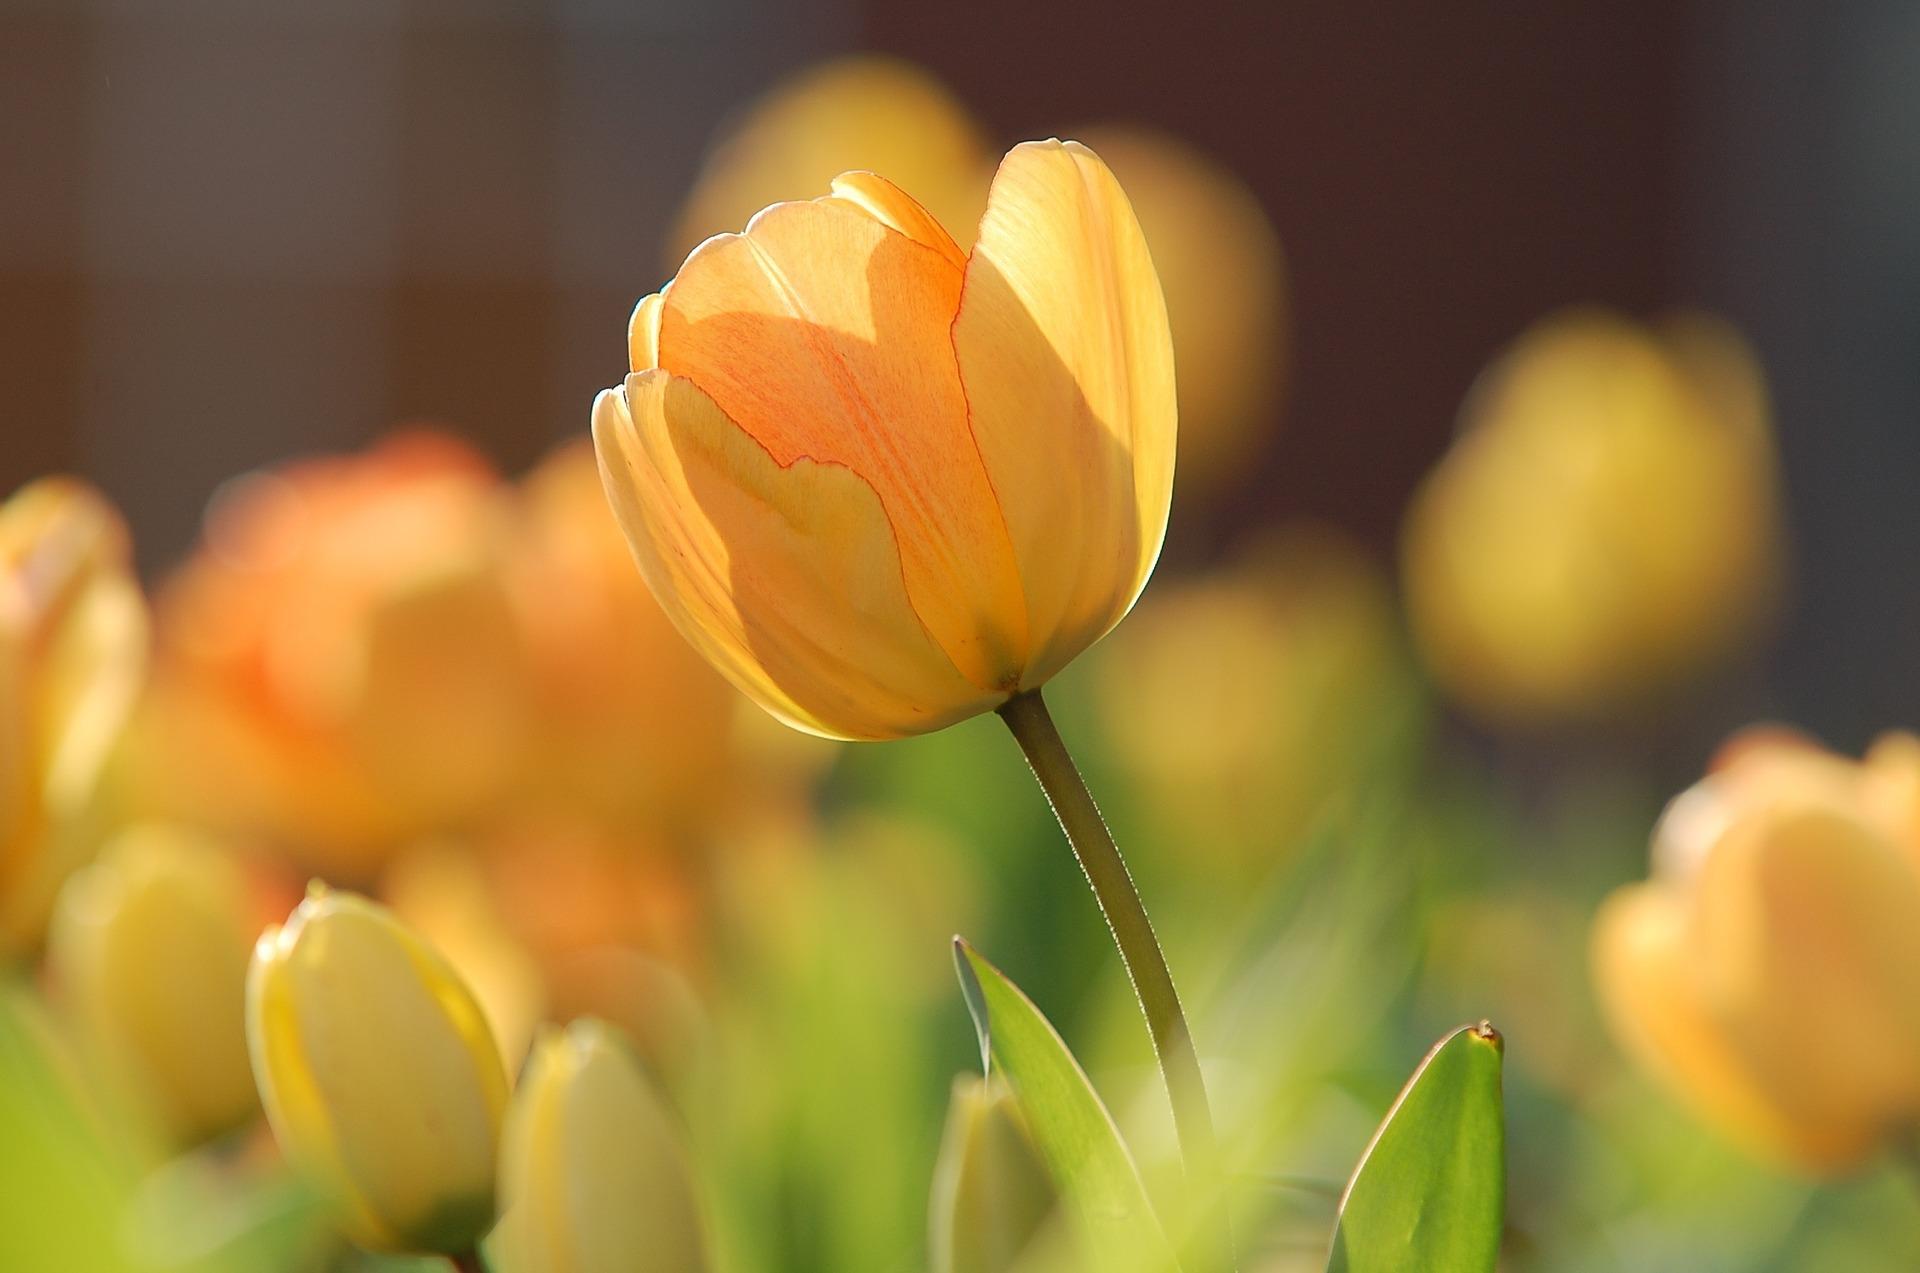 """Tulip Yellow Bright"" by Unsplash via Pixabay (Public Domain)"